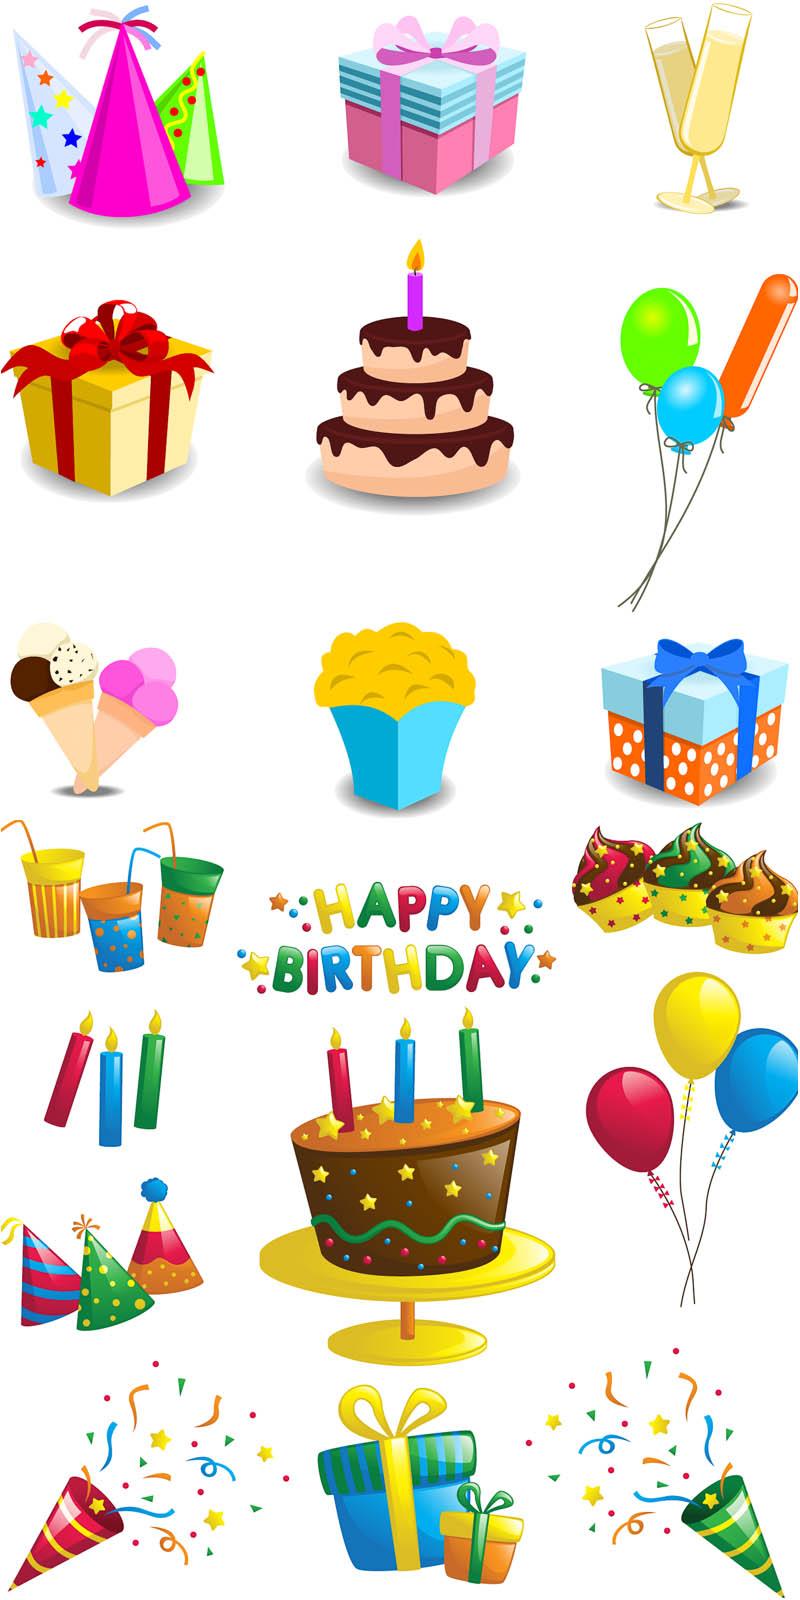 Happy Birthday Cartoon Decorations